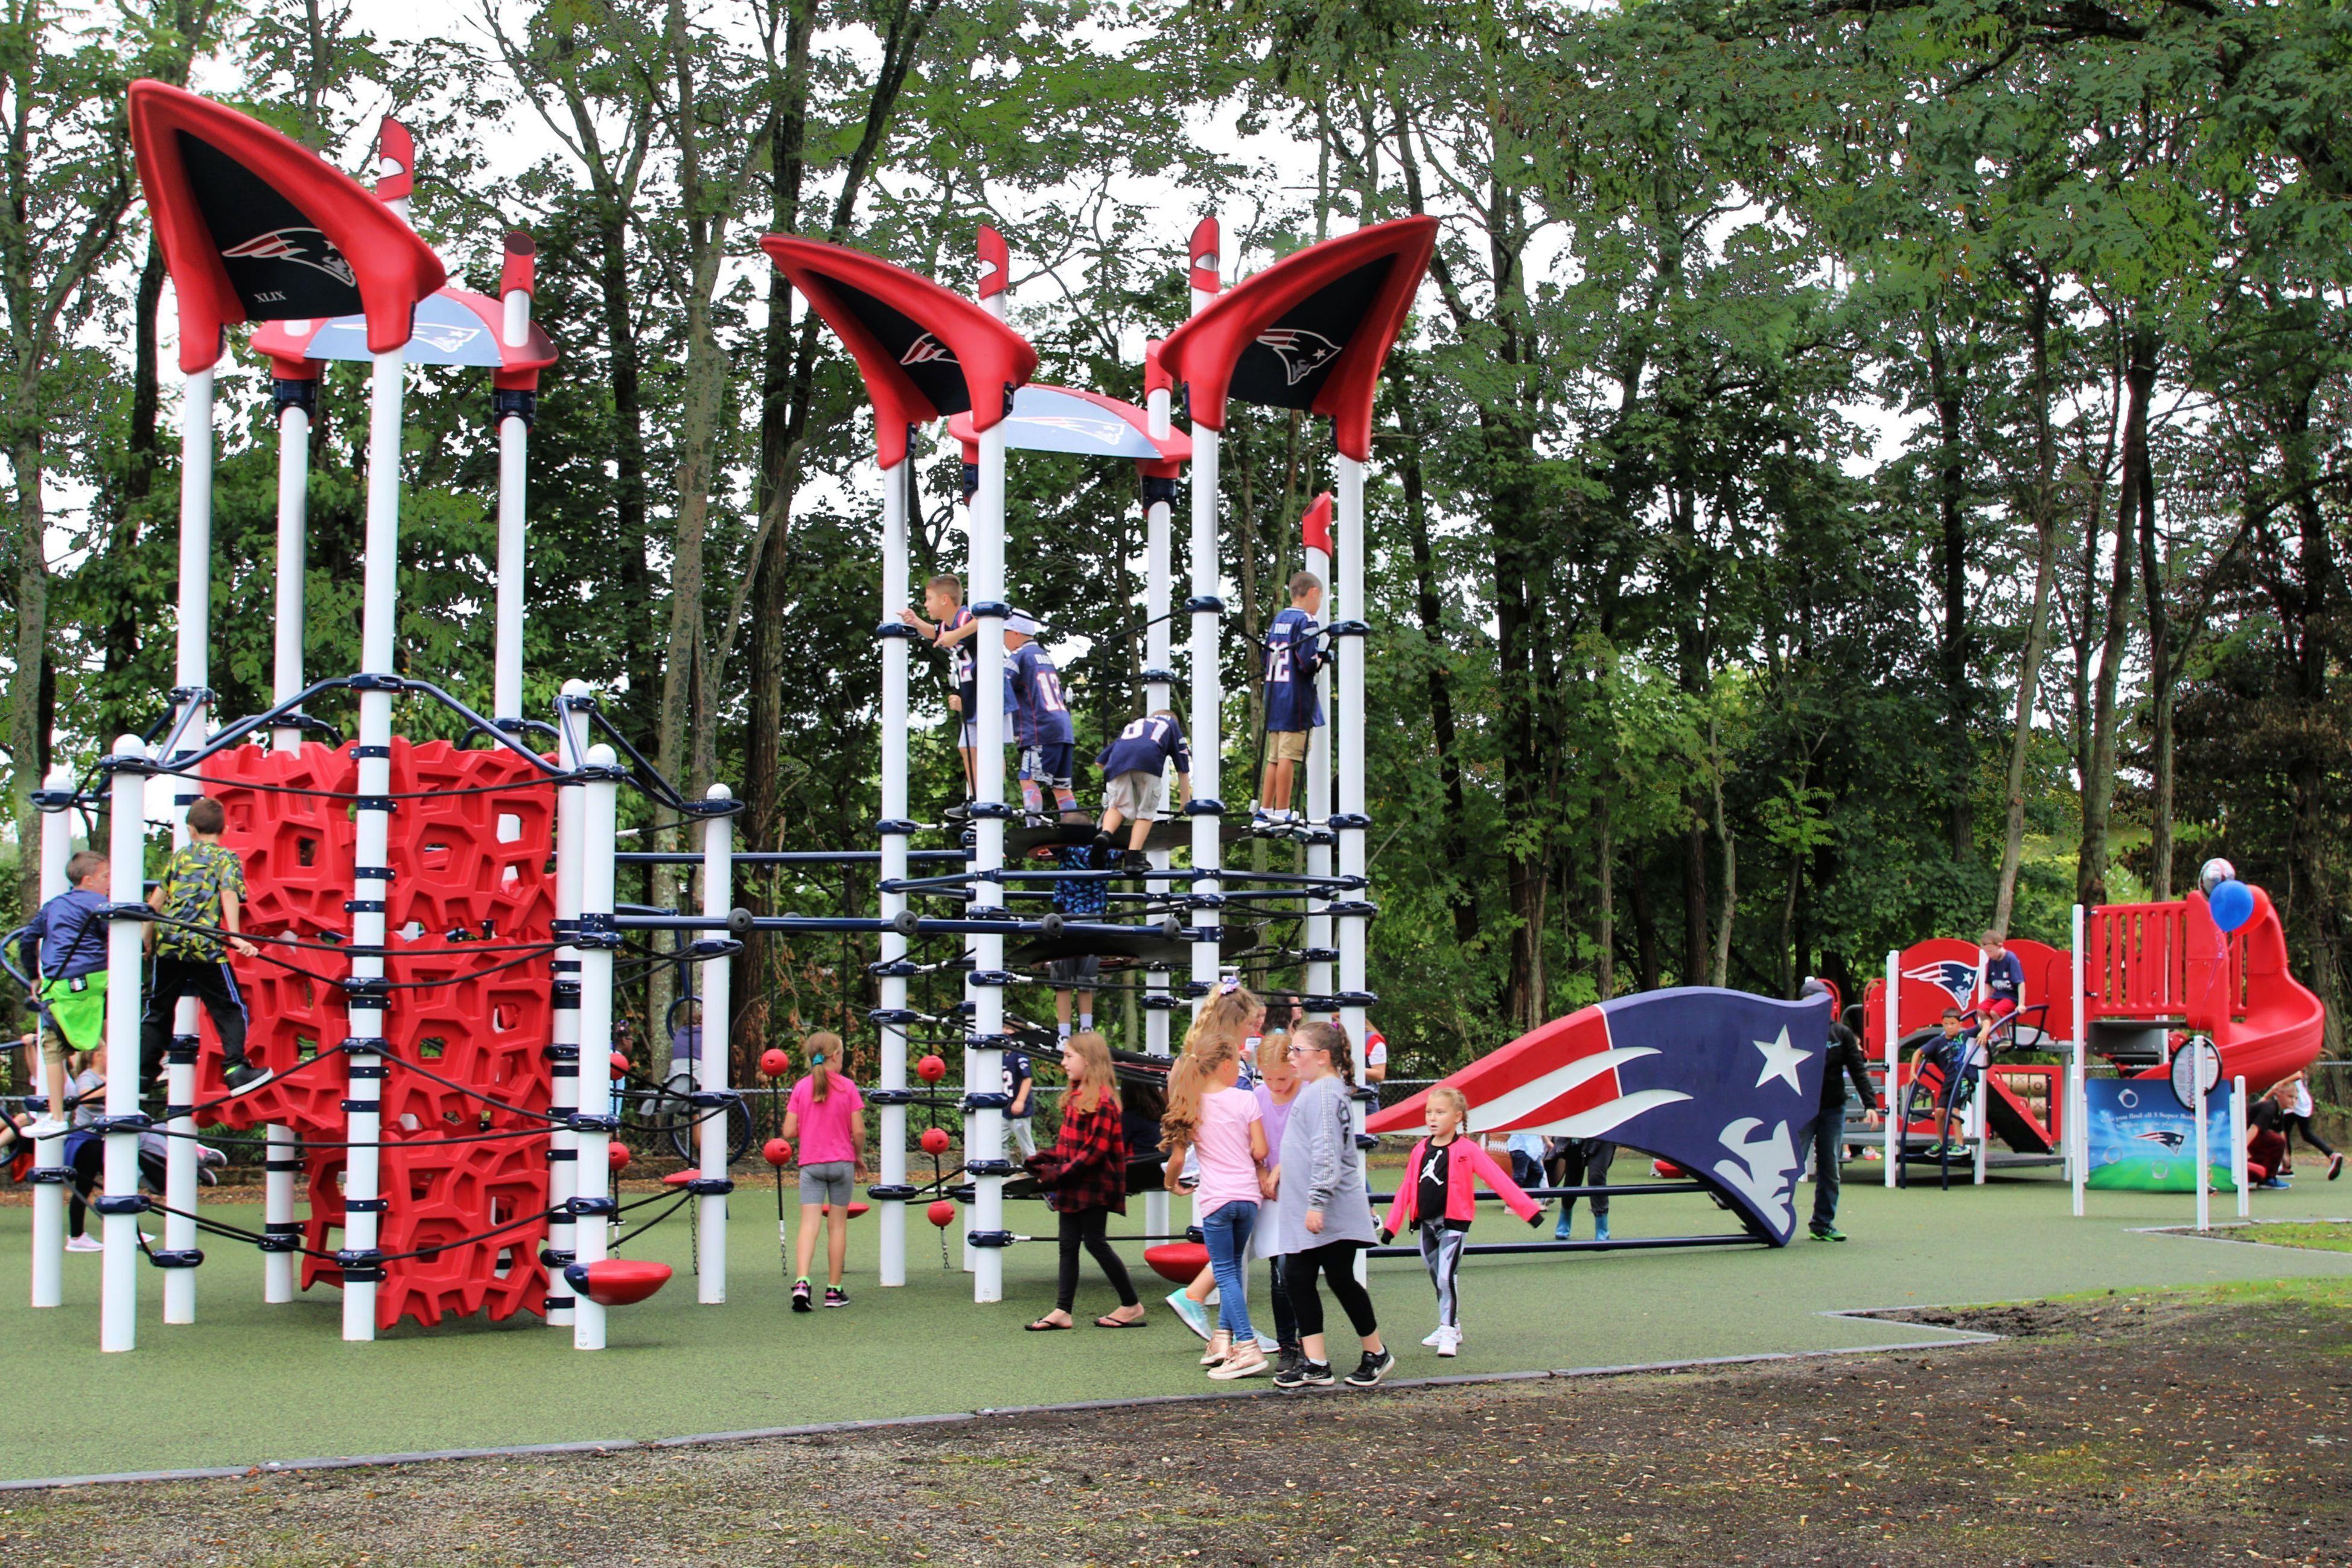 Patriots Pirates Castles Theme Playgrounds Spark Imaginative Play Around Boston Playground Boston Things To Do Boston With Kids